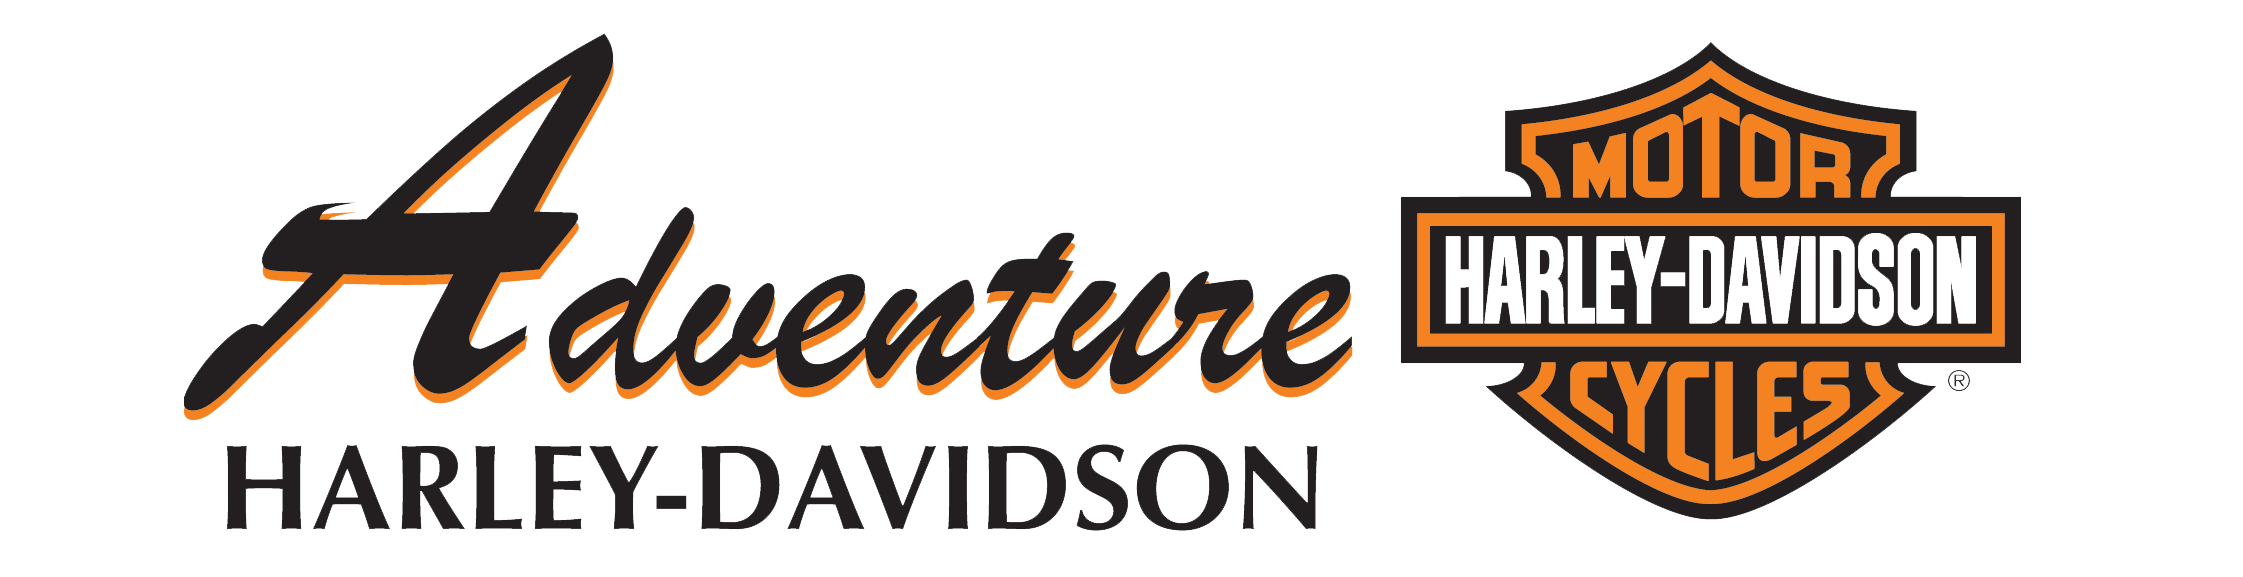 Visit Harley-Davidson Motorcycles